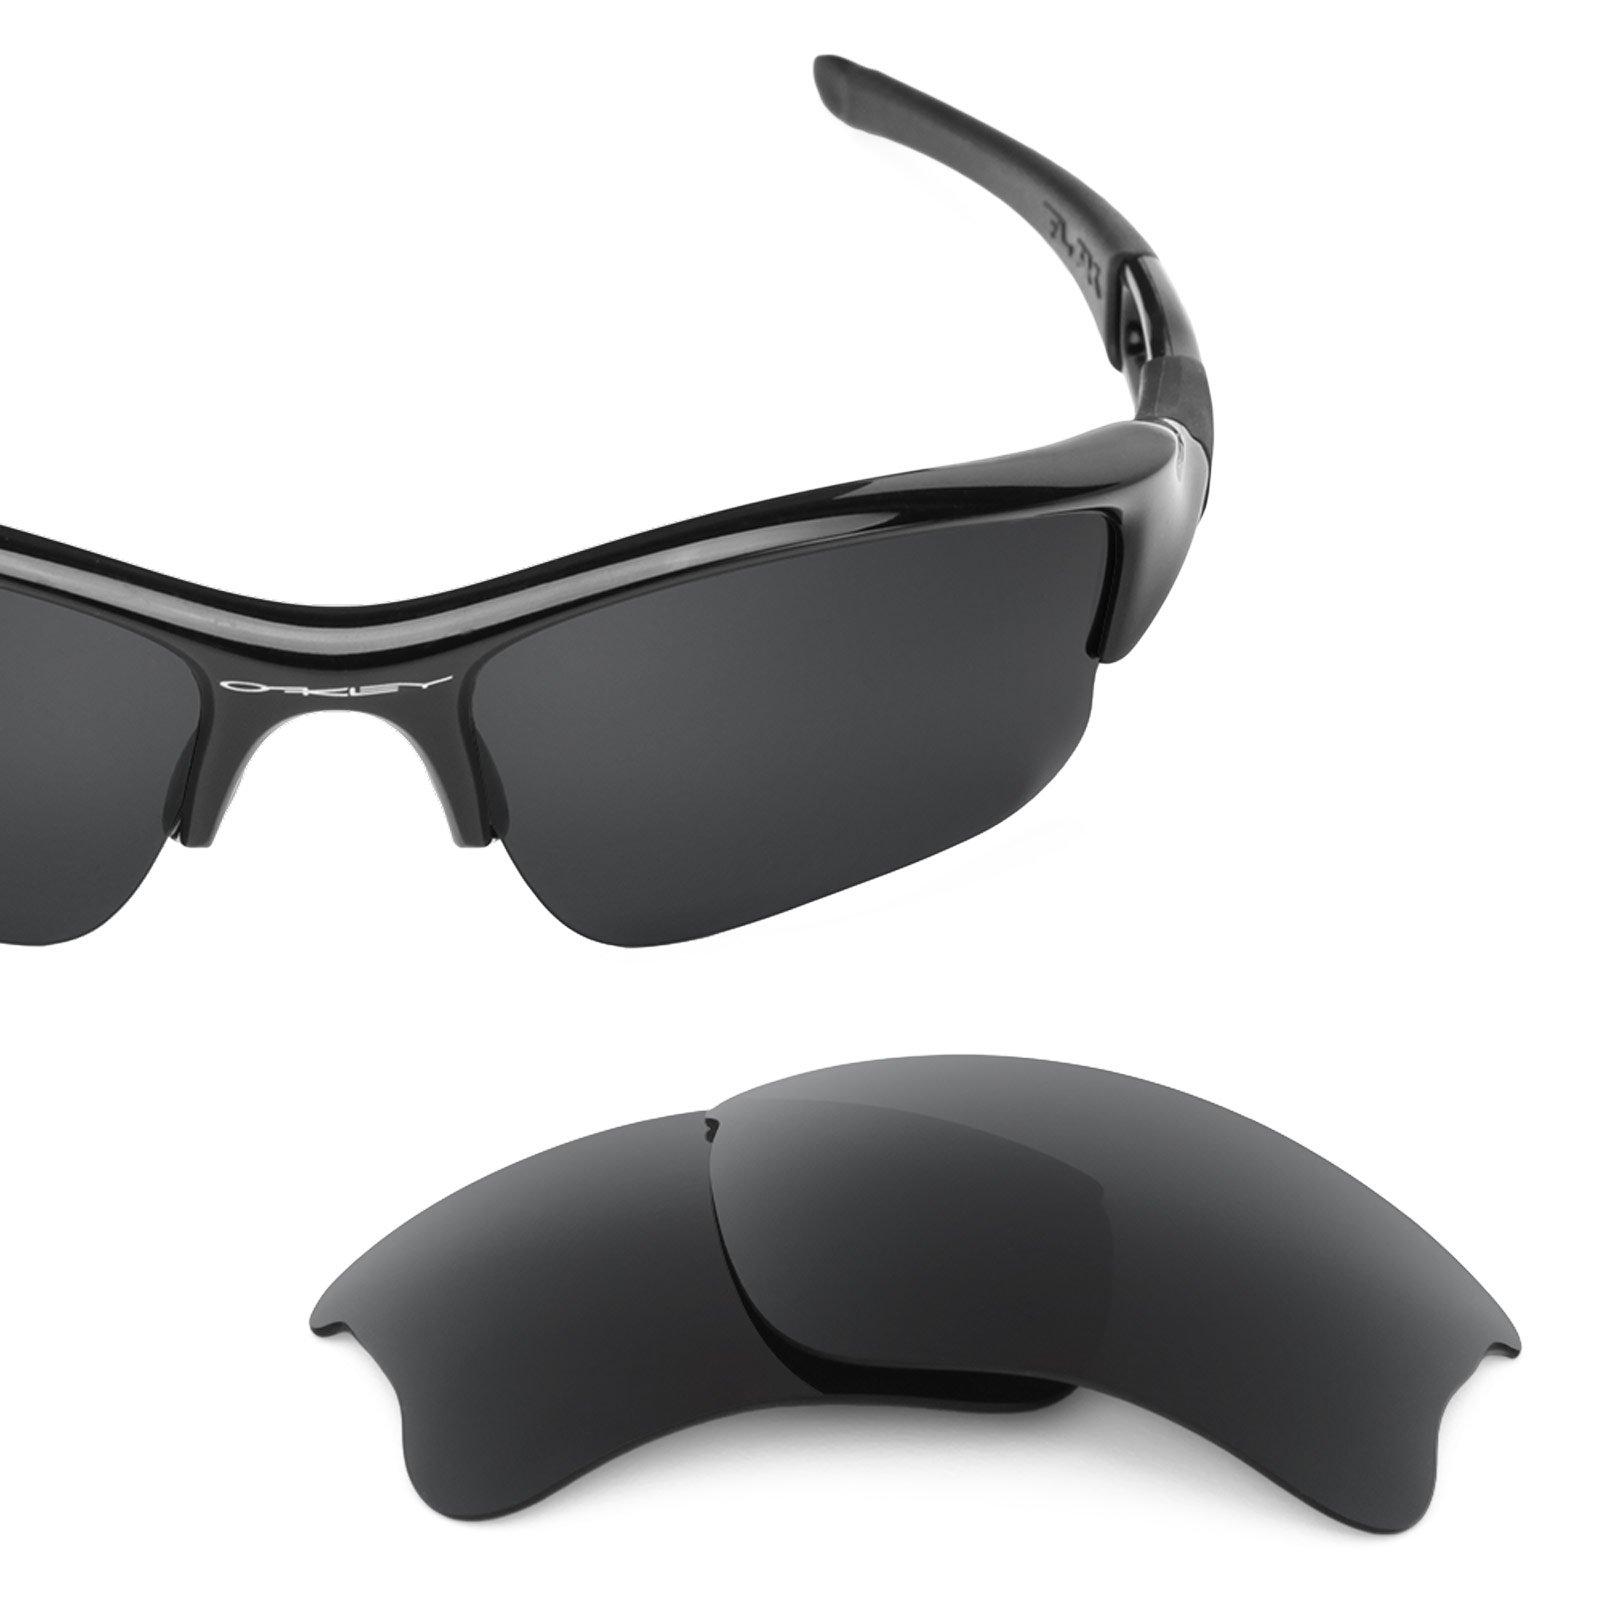 Revant Replacement Lenses for Oakley Flak Jacket XLJ Stealth Black